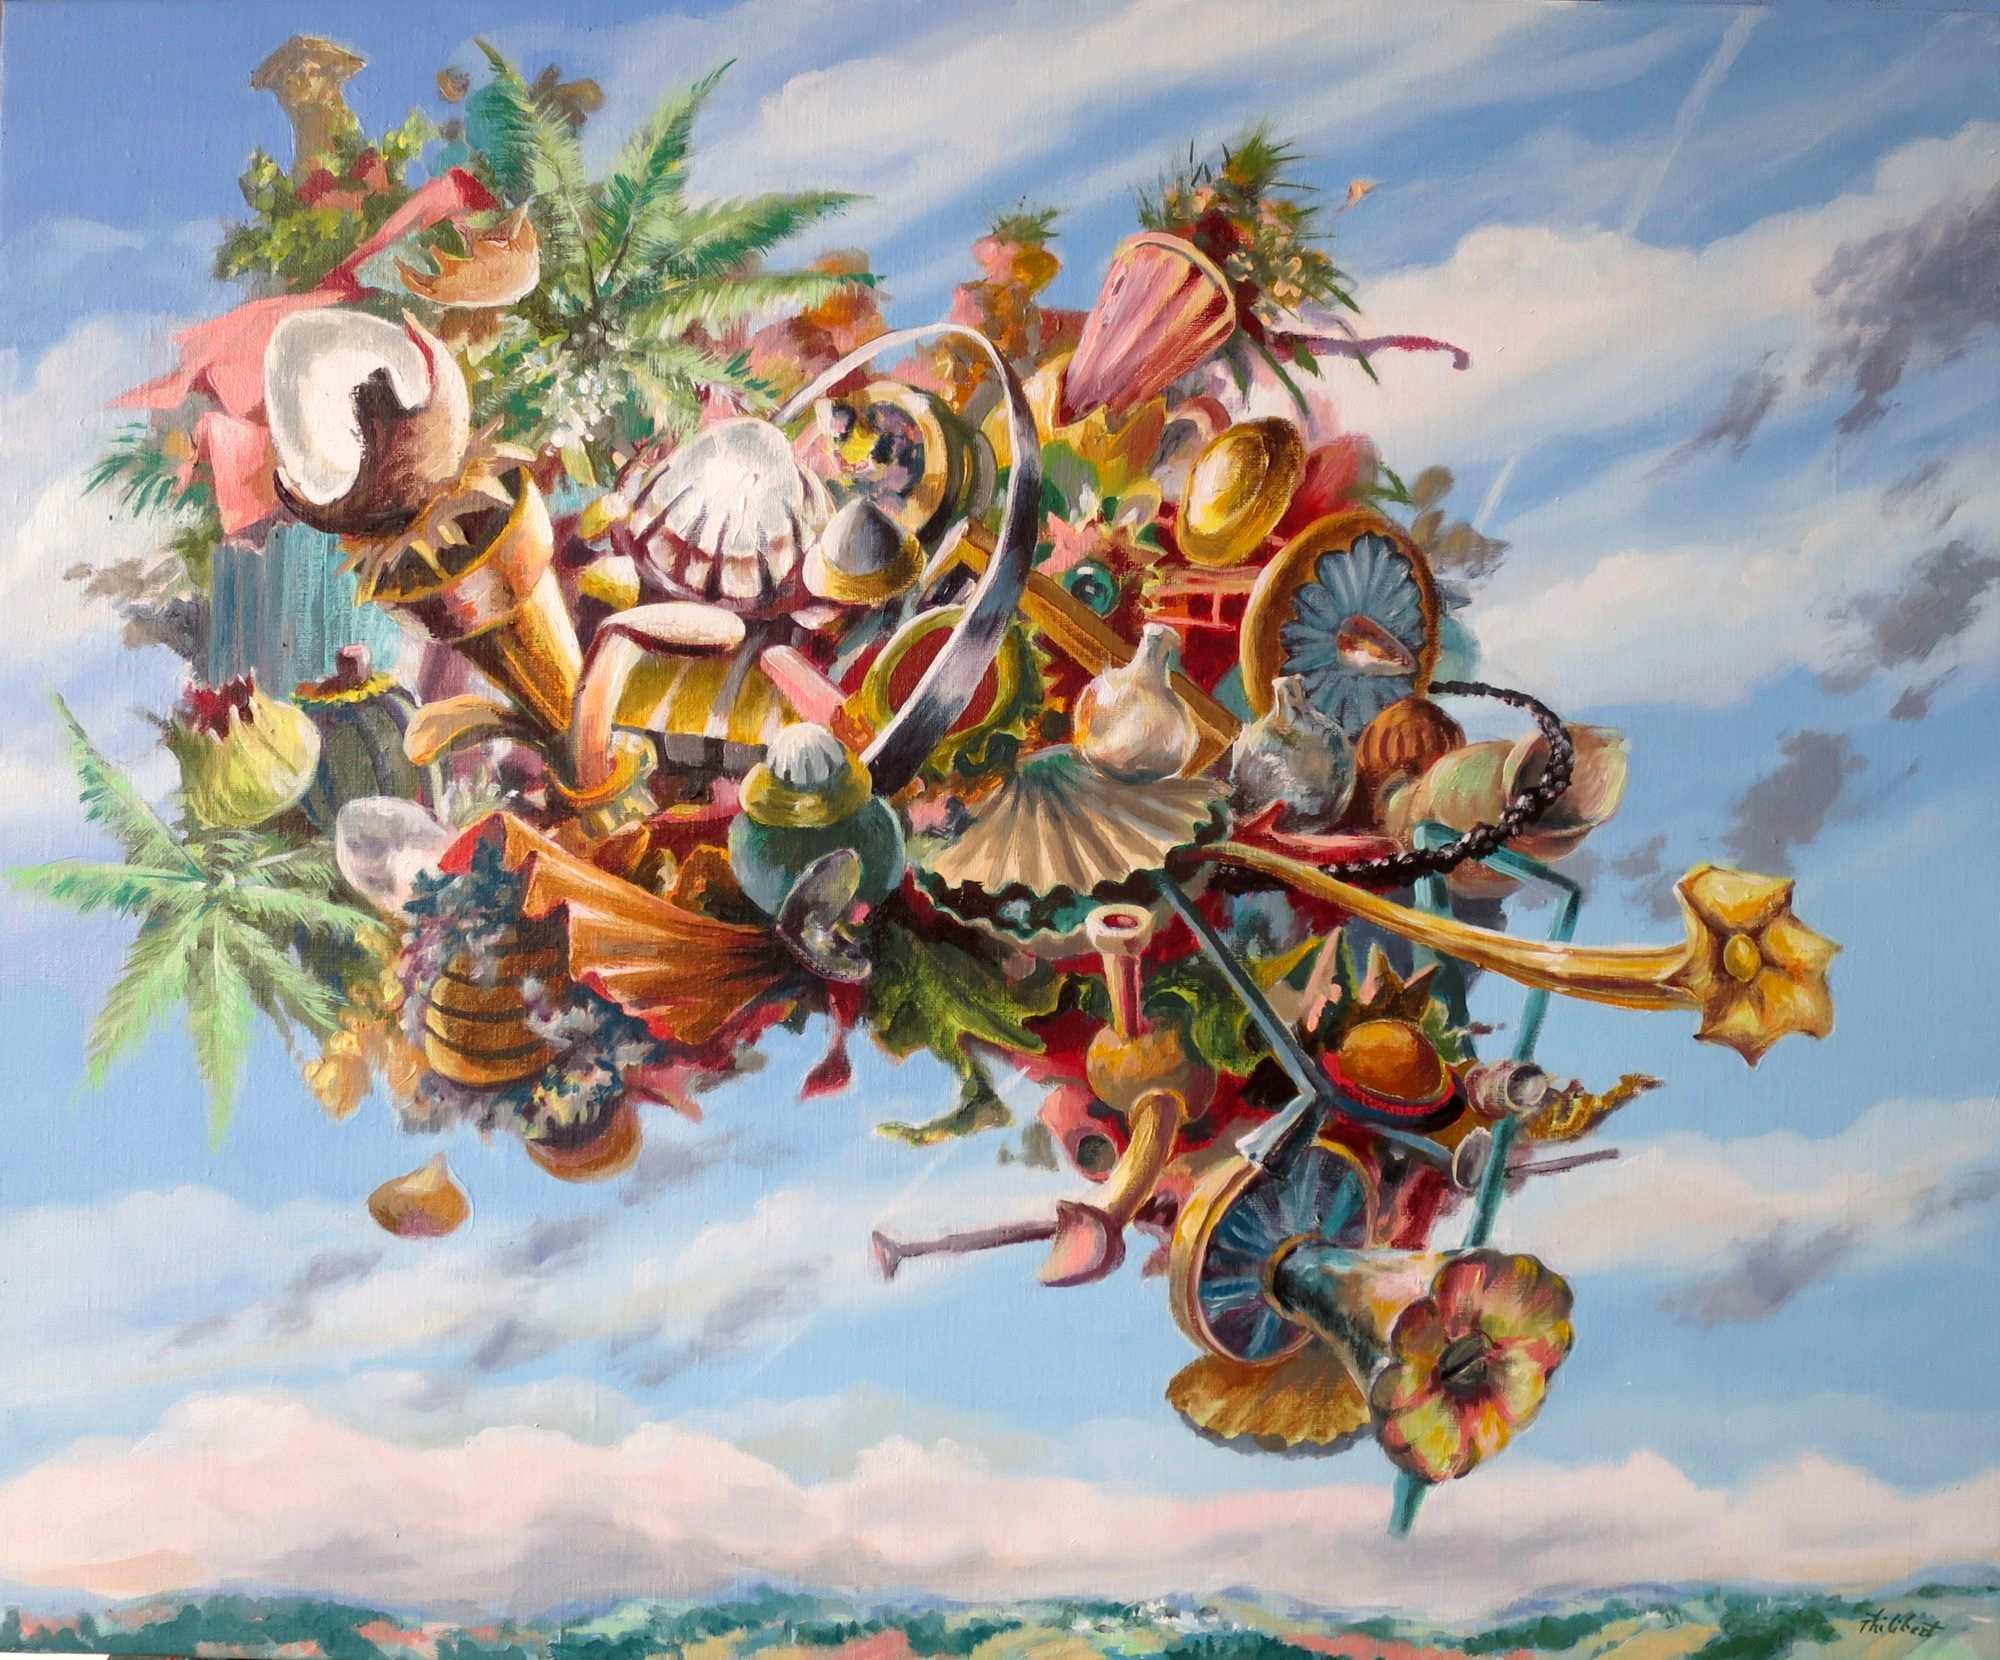 Linvitation au voyage2015 philibert attraction universelle huile sur toile 73x60cm nov 2014 stopboris Gallery